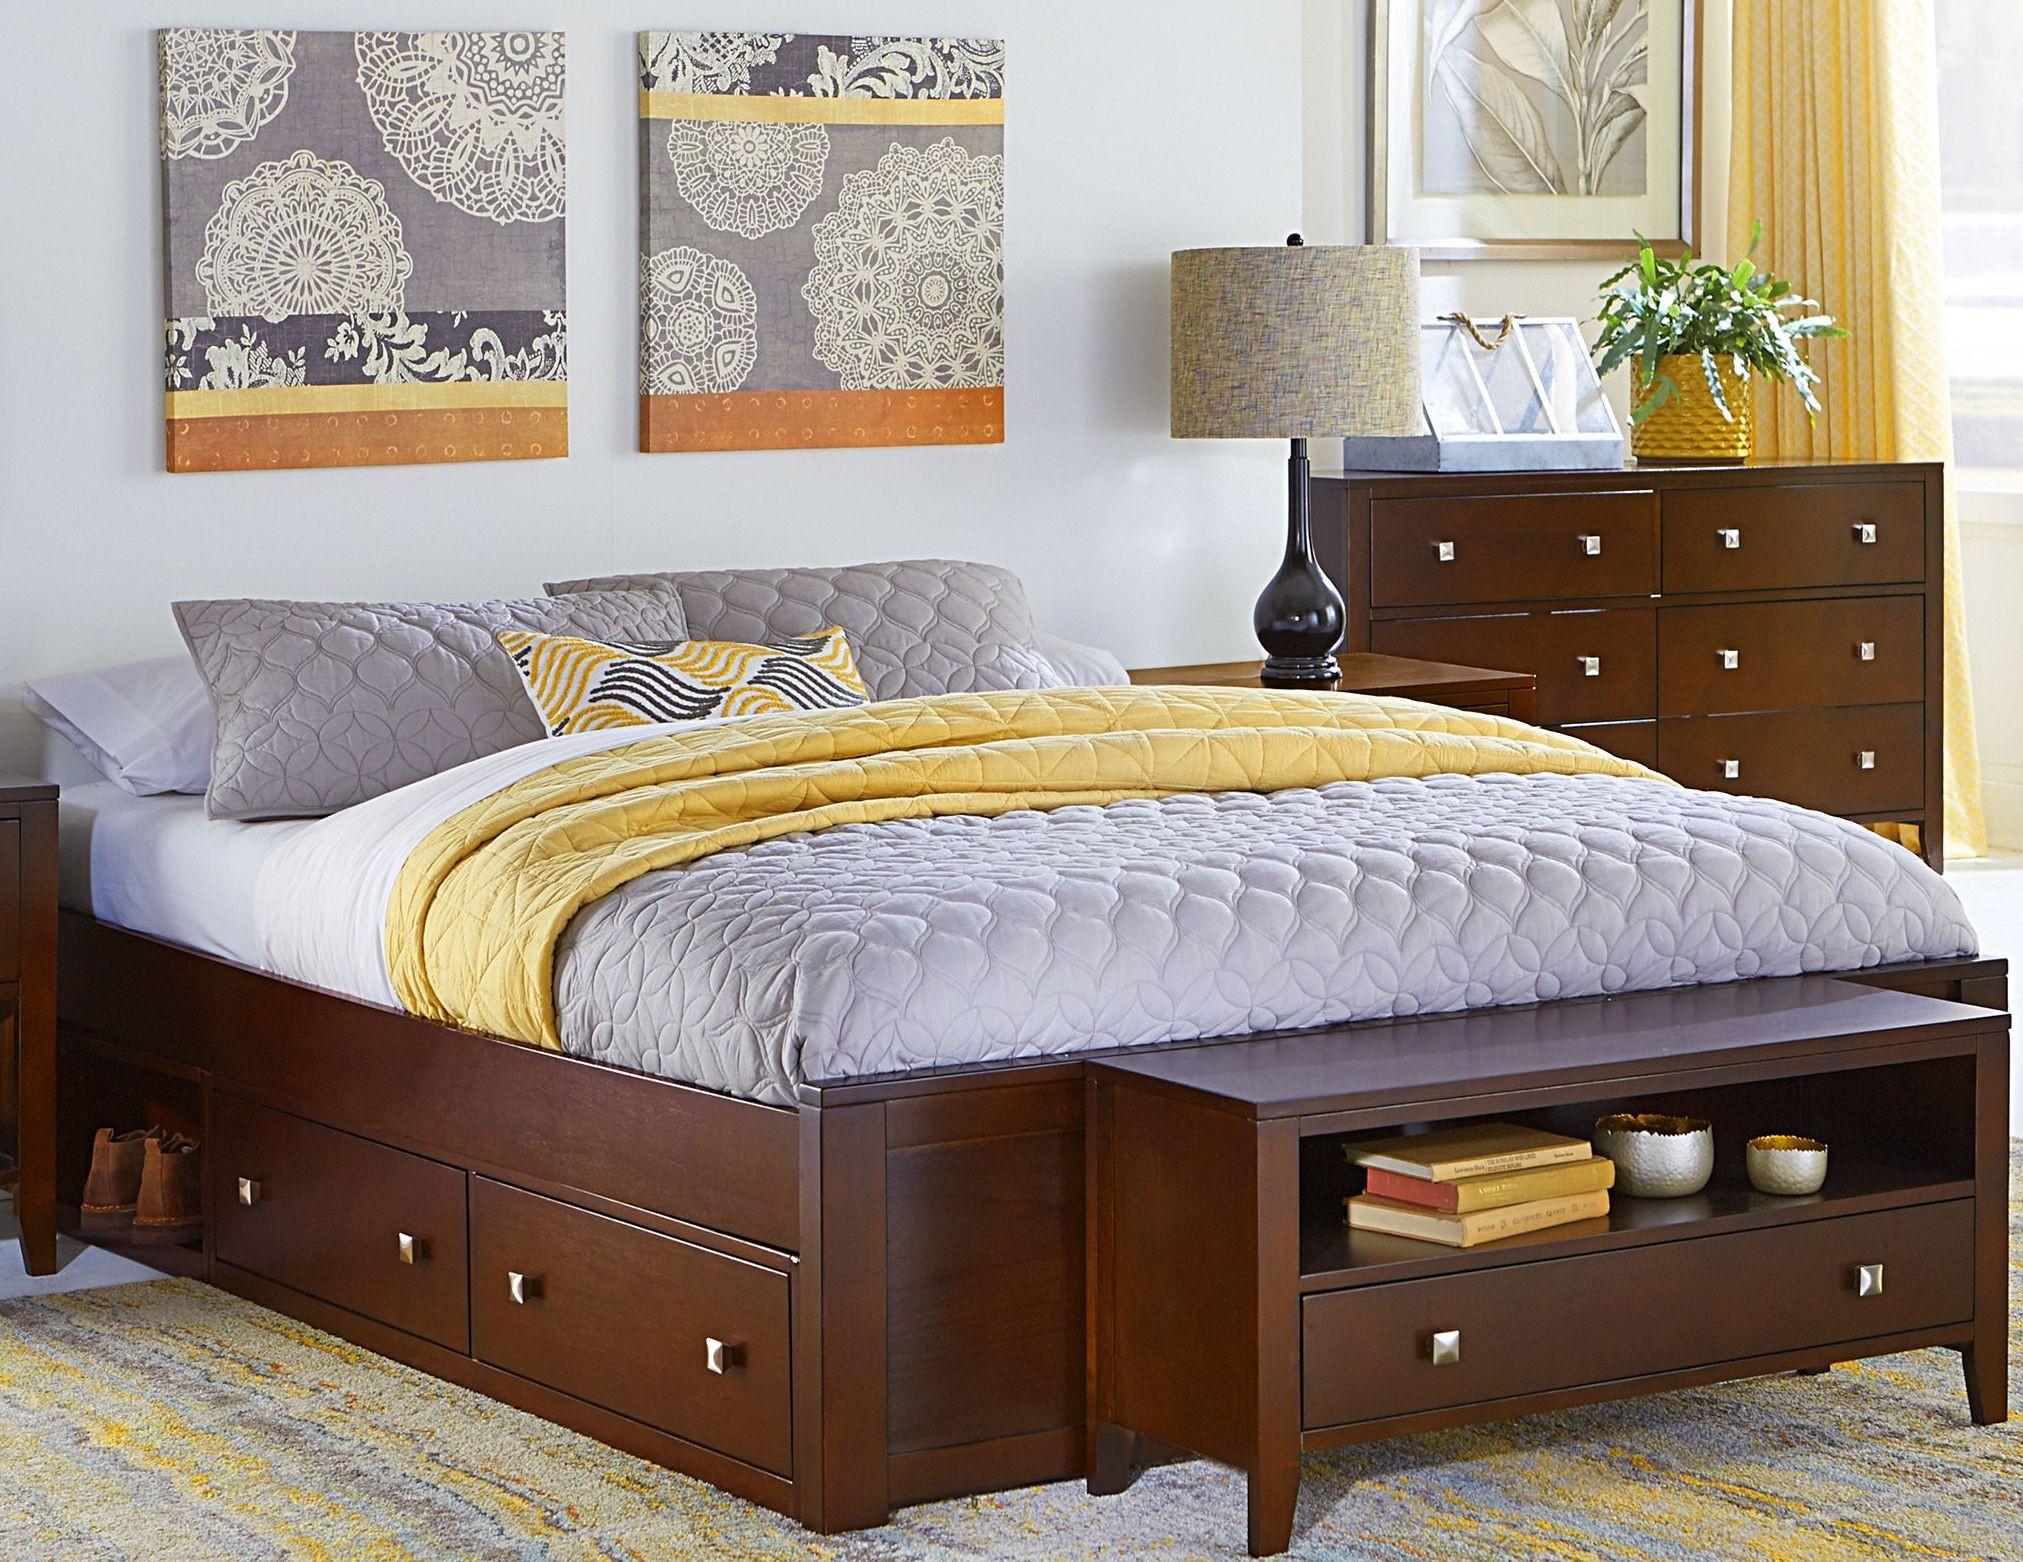 pulse cherry queen platform bed with storage 31003ns ne kids. Black Bedroom Furniture Sets. Home Design Ideas